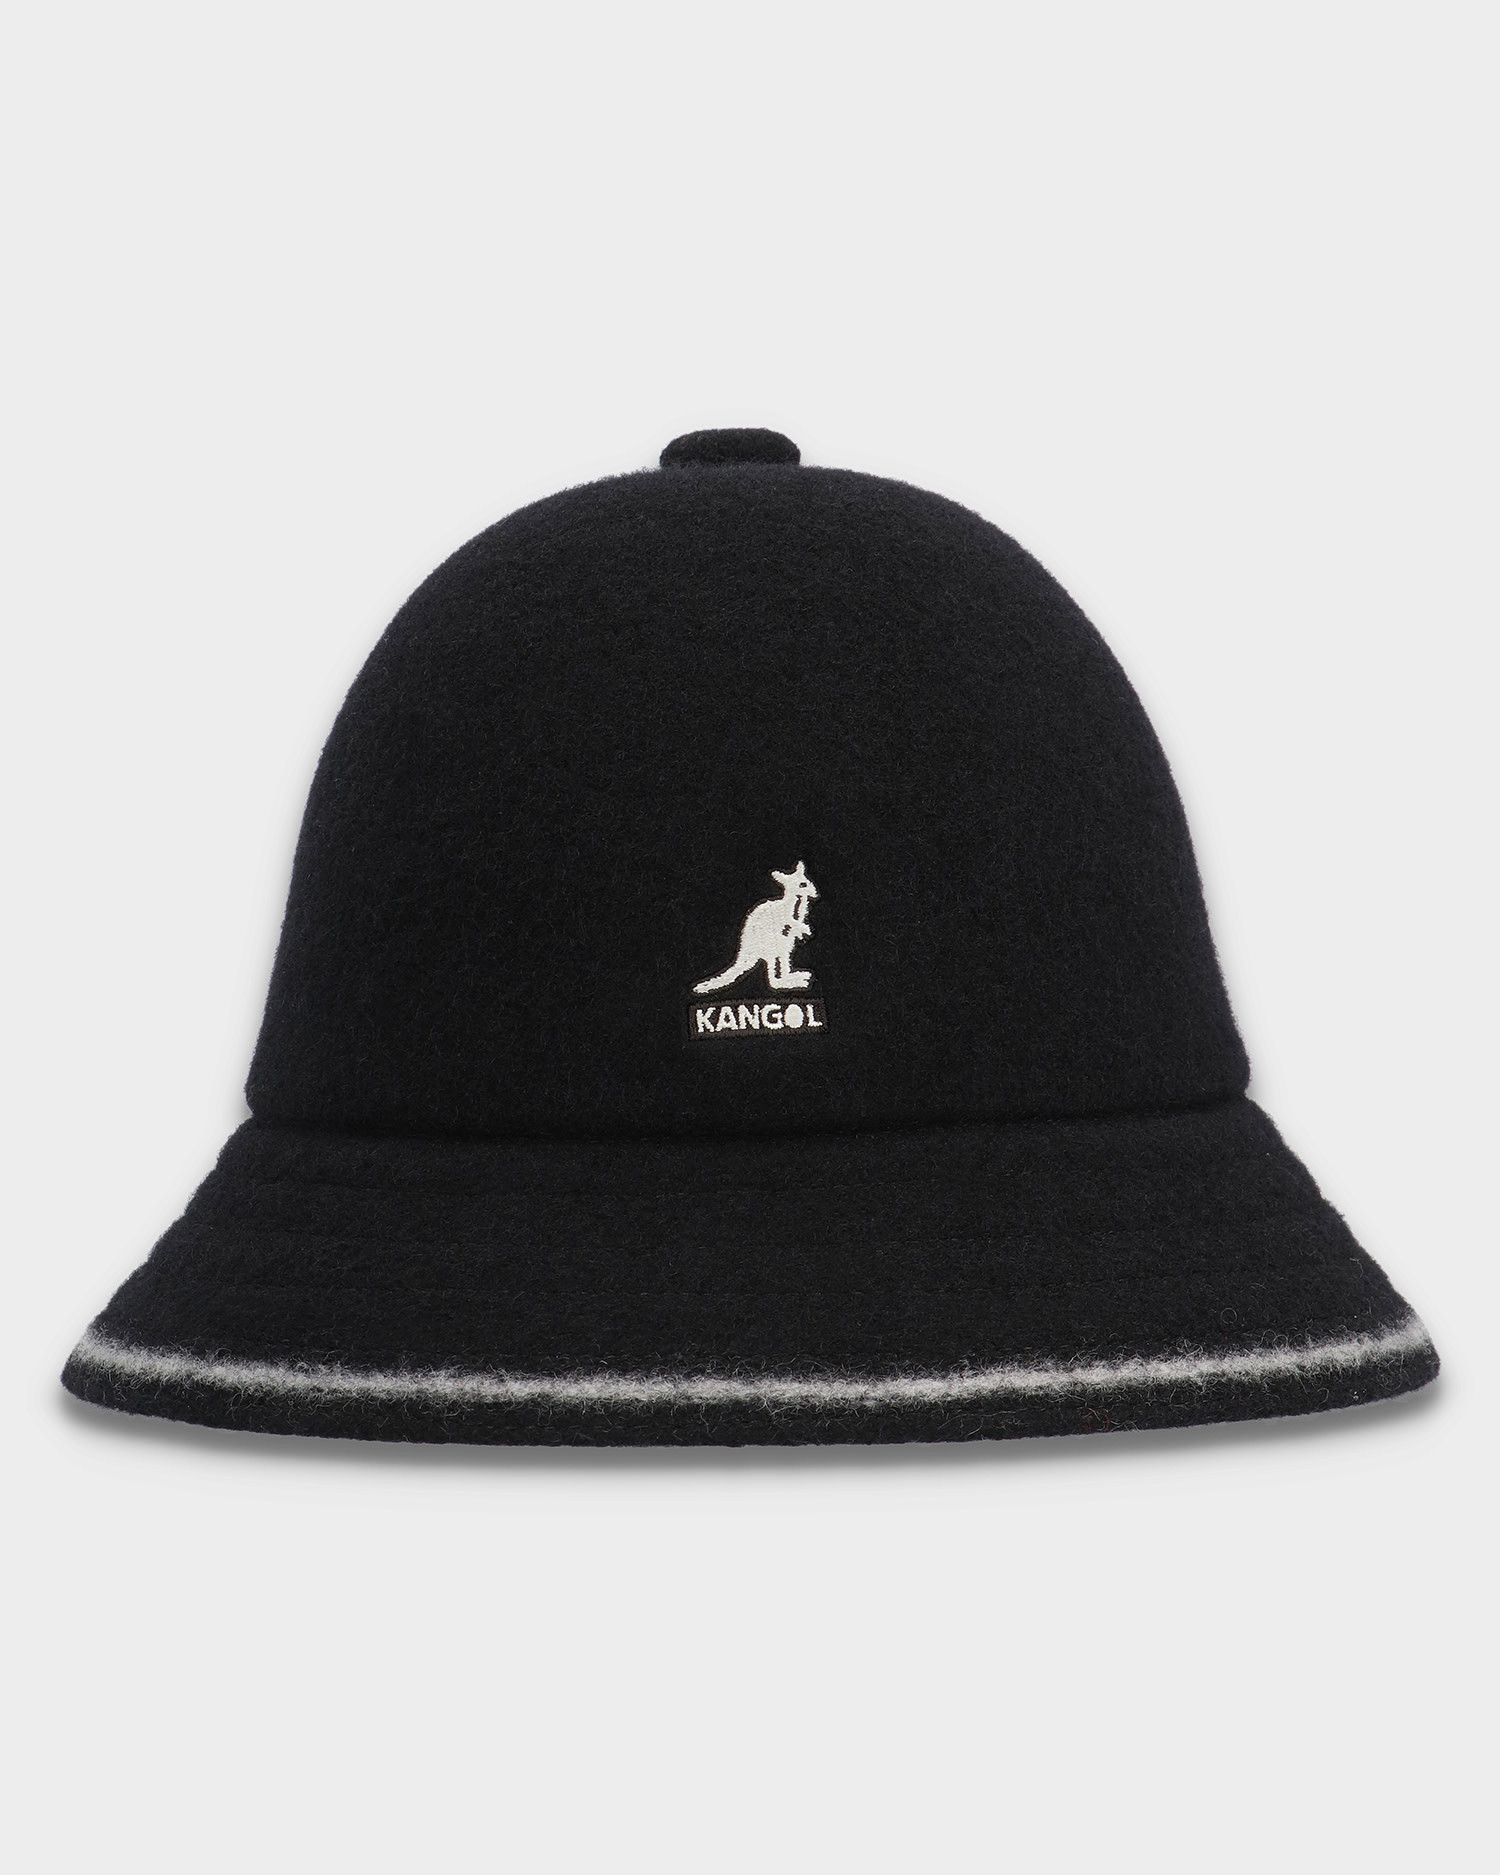 Kangol Stripe Casual Hat Black/Off White